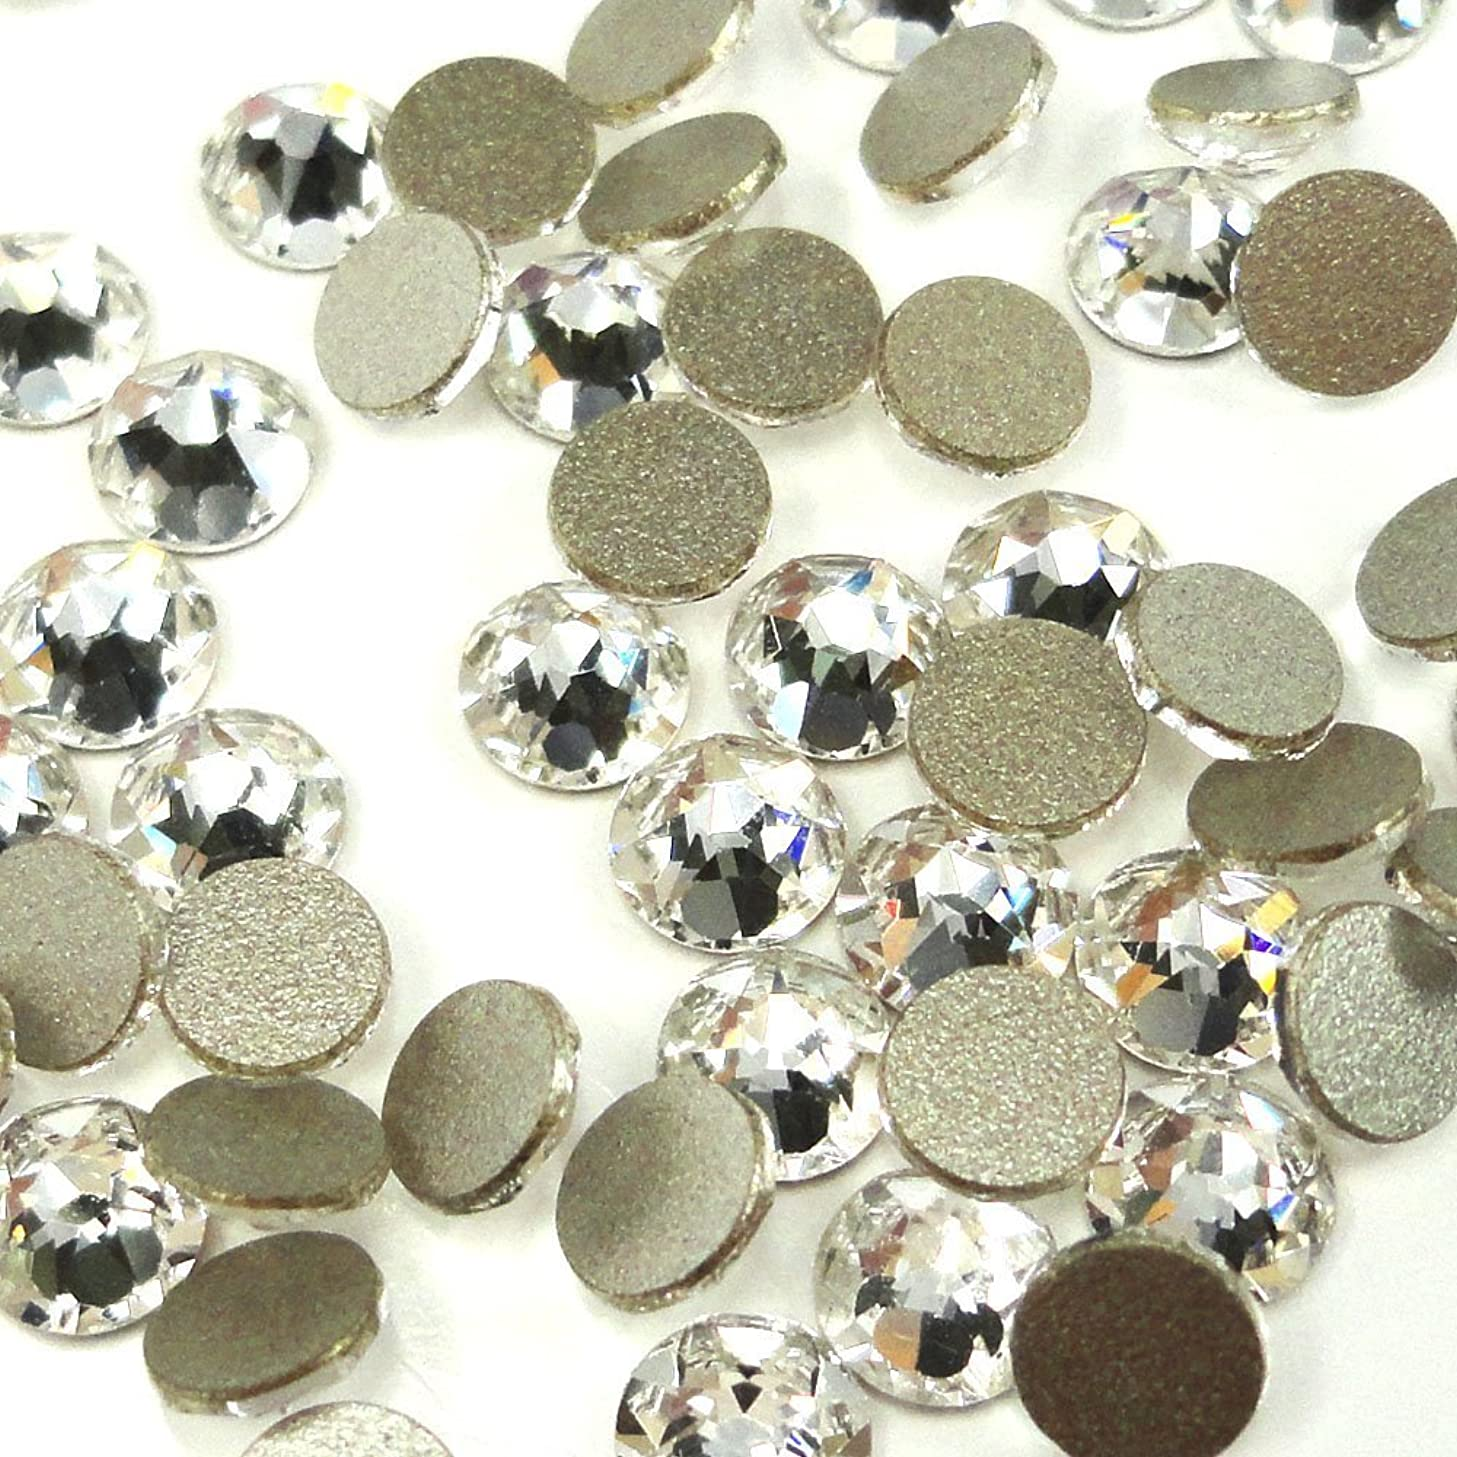 Crystal-Wholesale 2088-SS20-Crystal Swarovski Crystals,